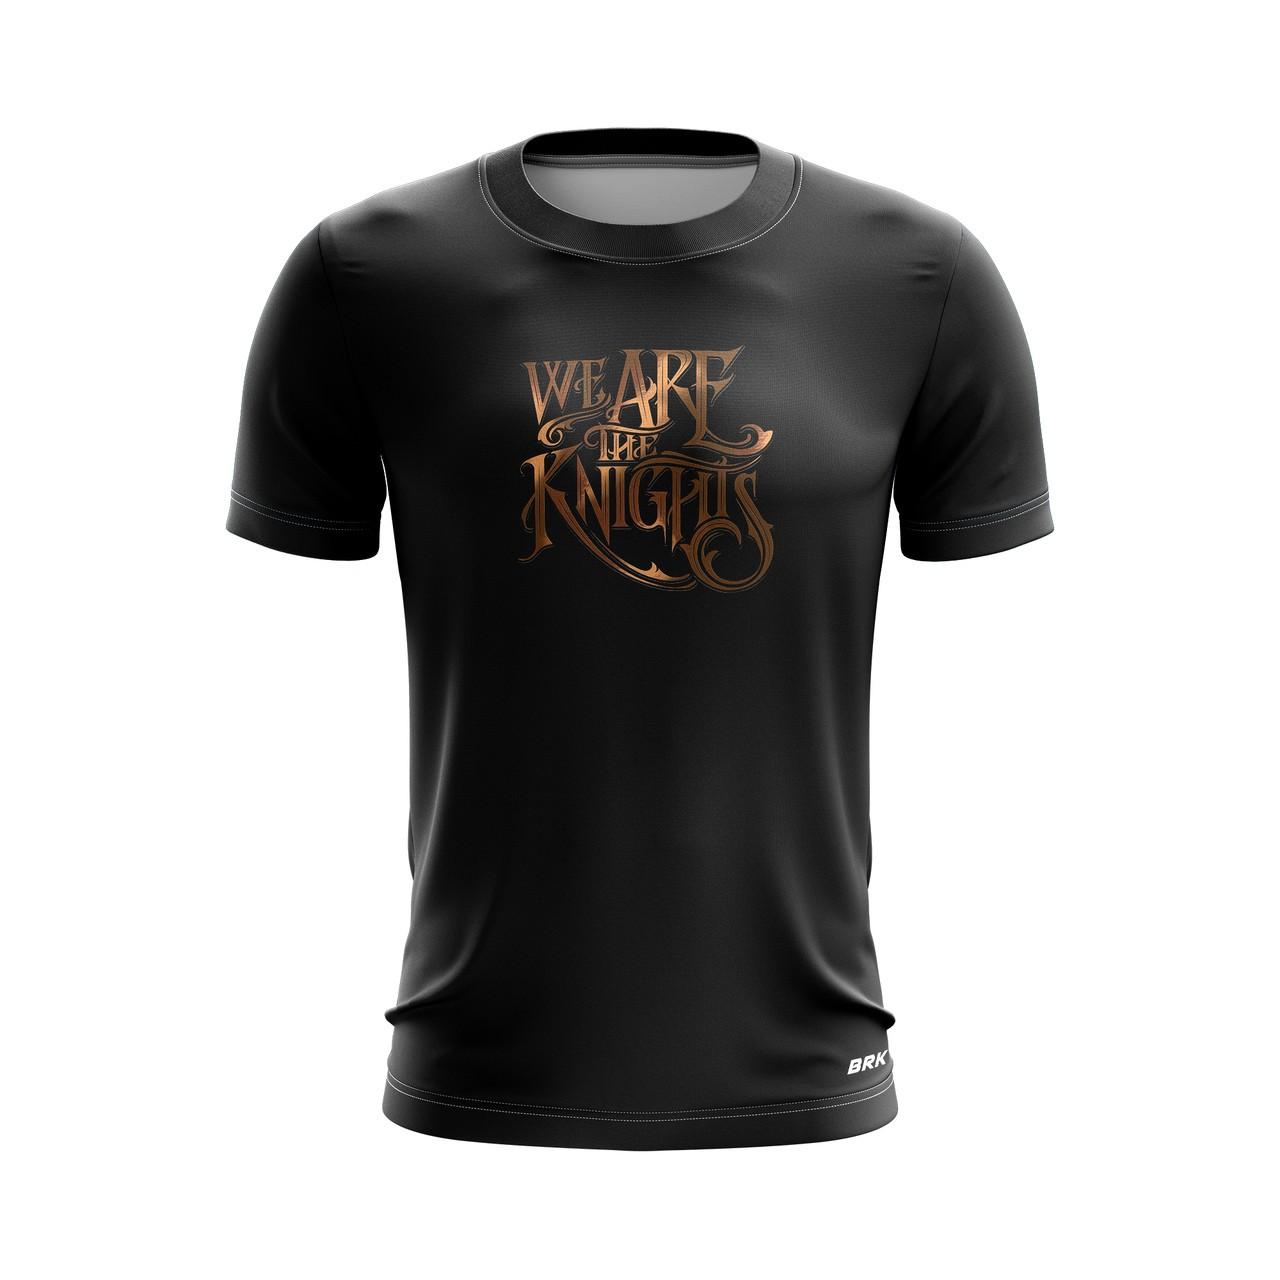 Camiseta Casual Brk Motociclismo Triumph We Are The Knights com FPU 50+